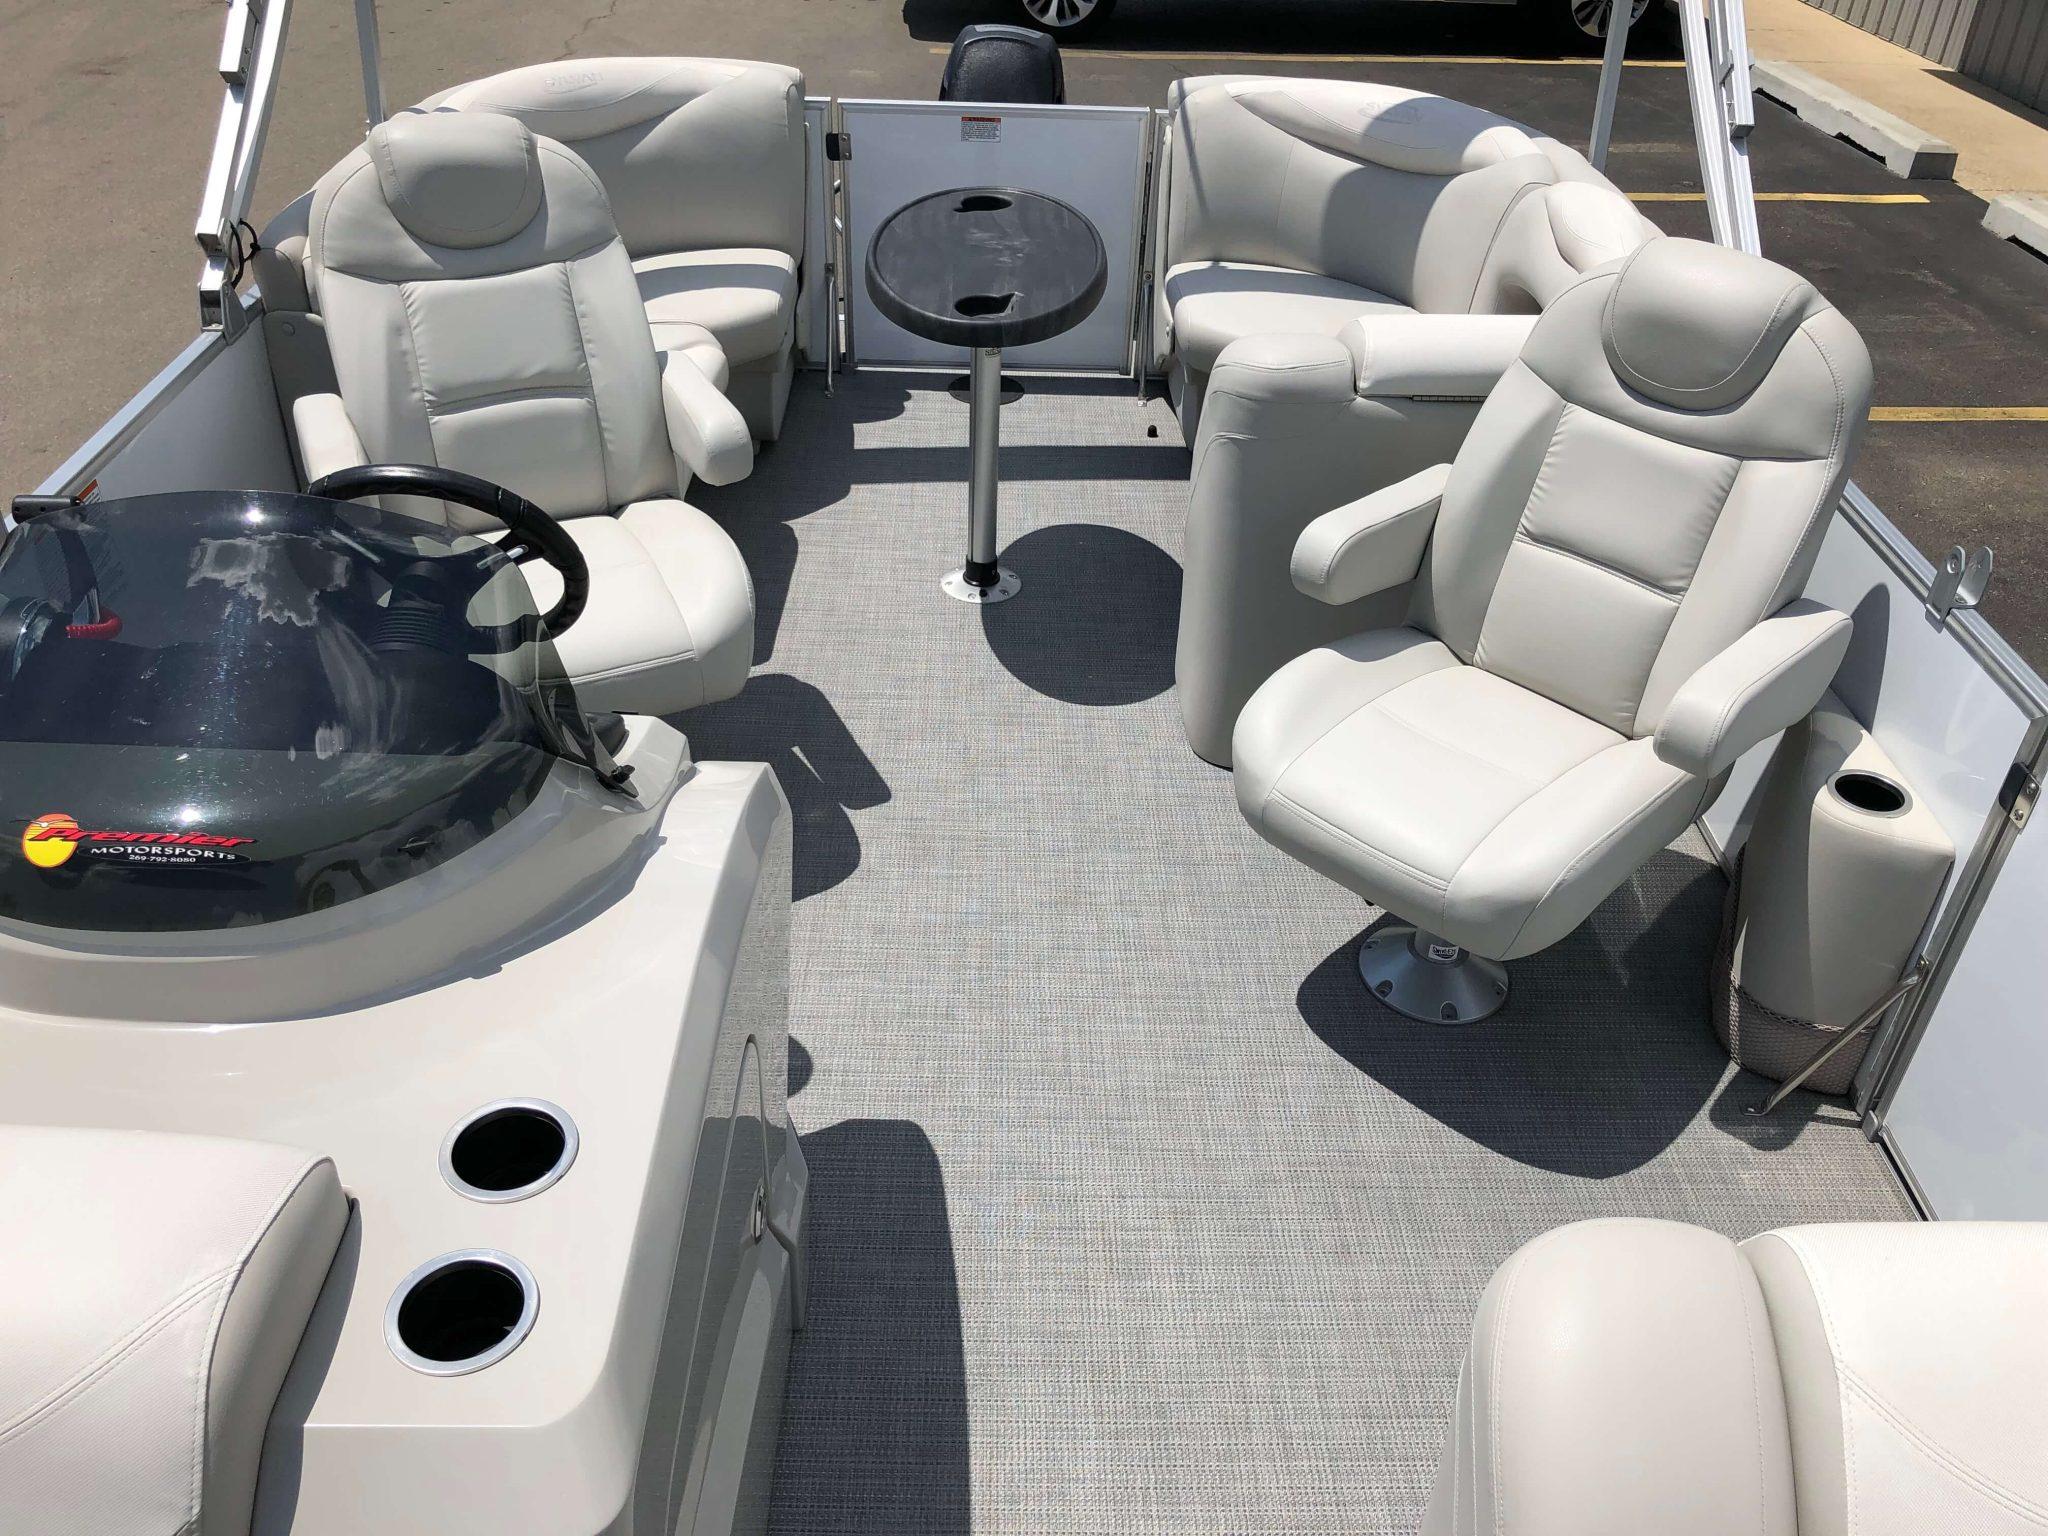 2016 Sylvan 8520 LZ LES Pontoon Boat Layout 4